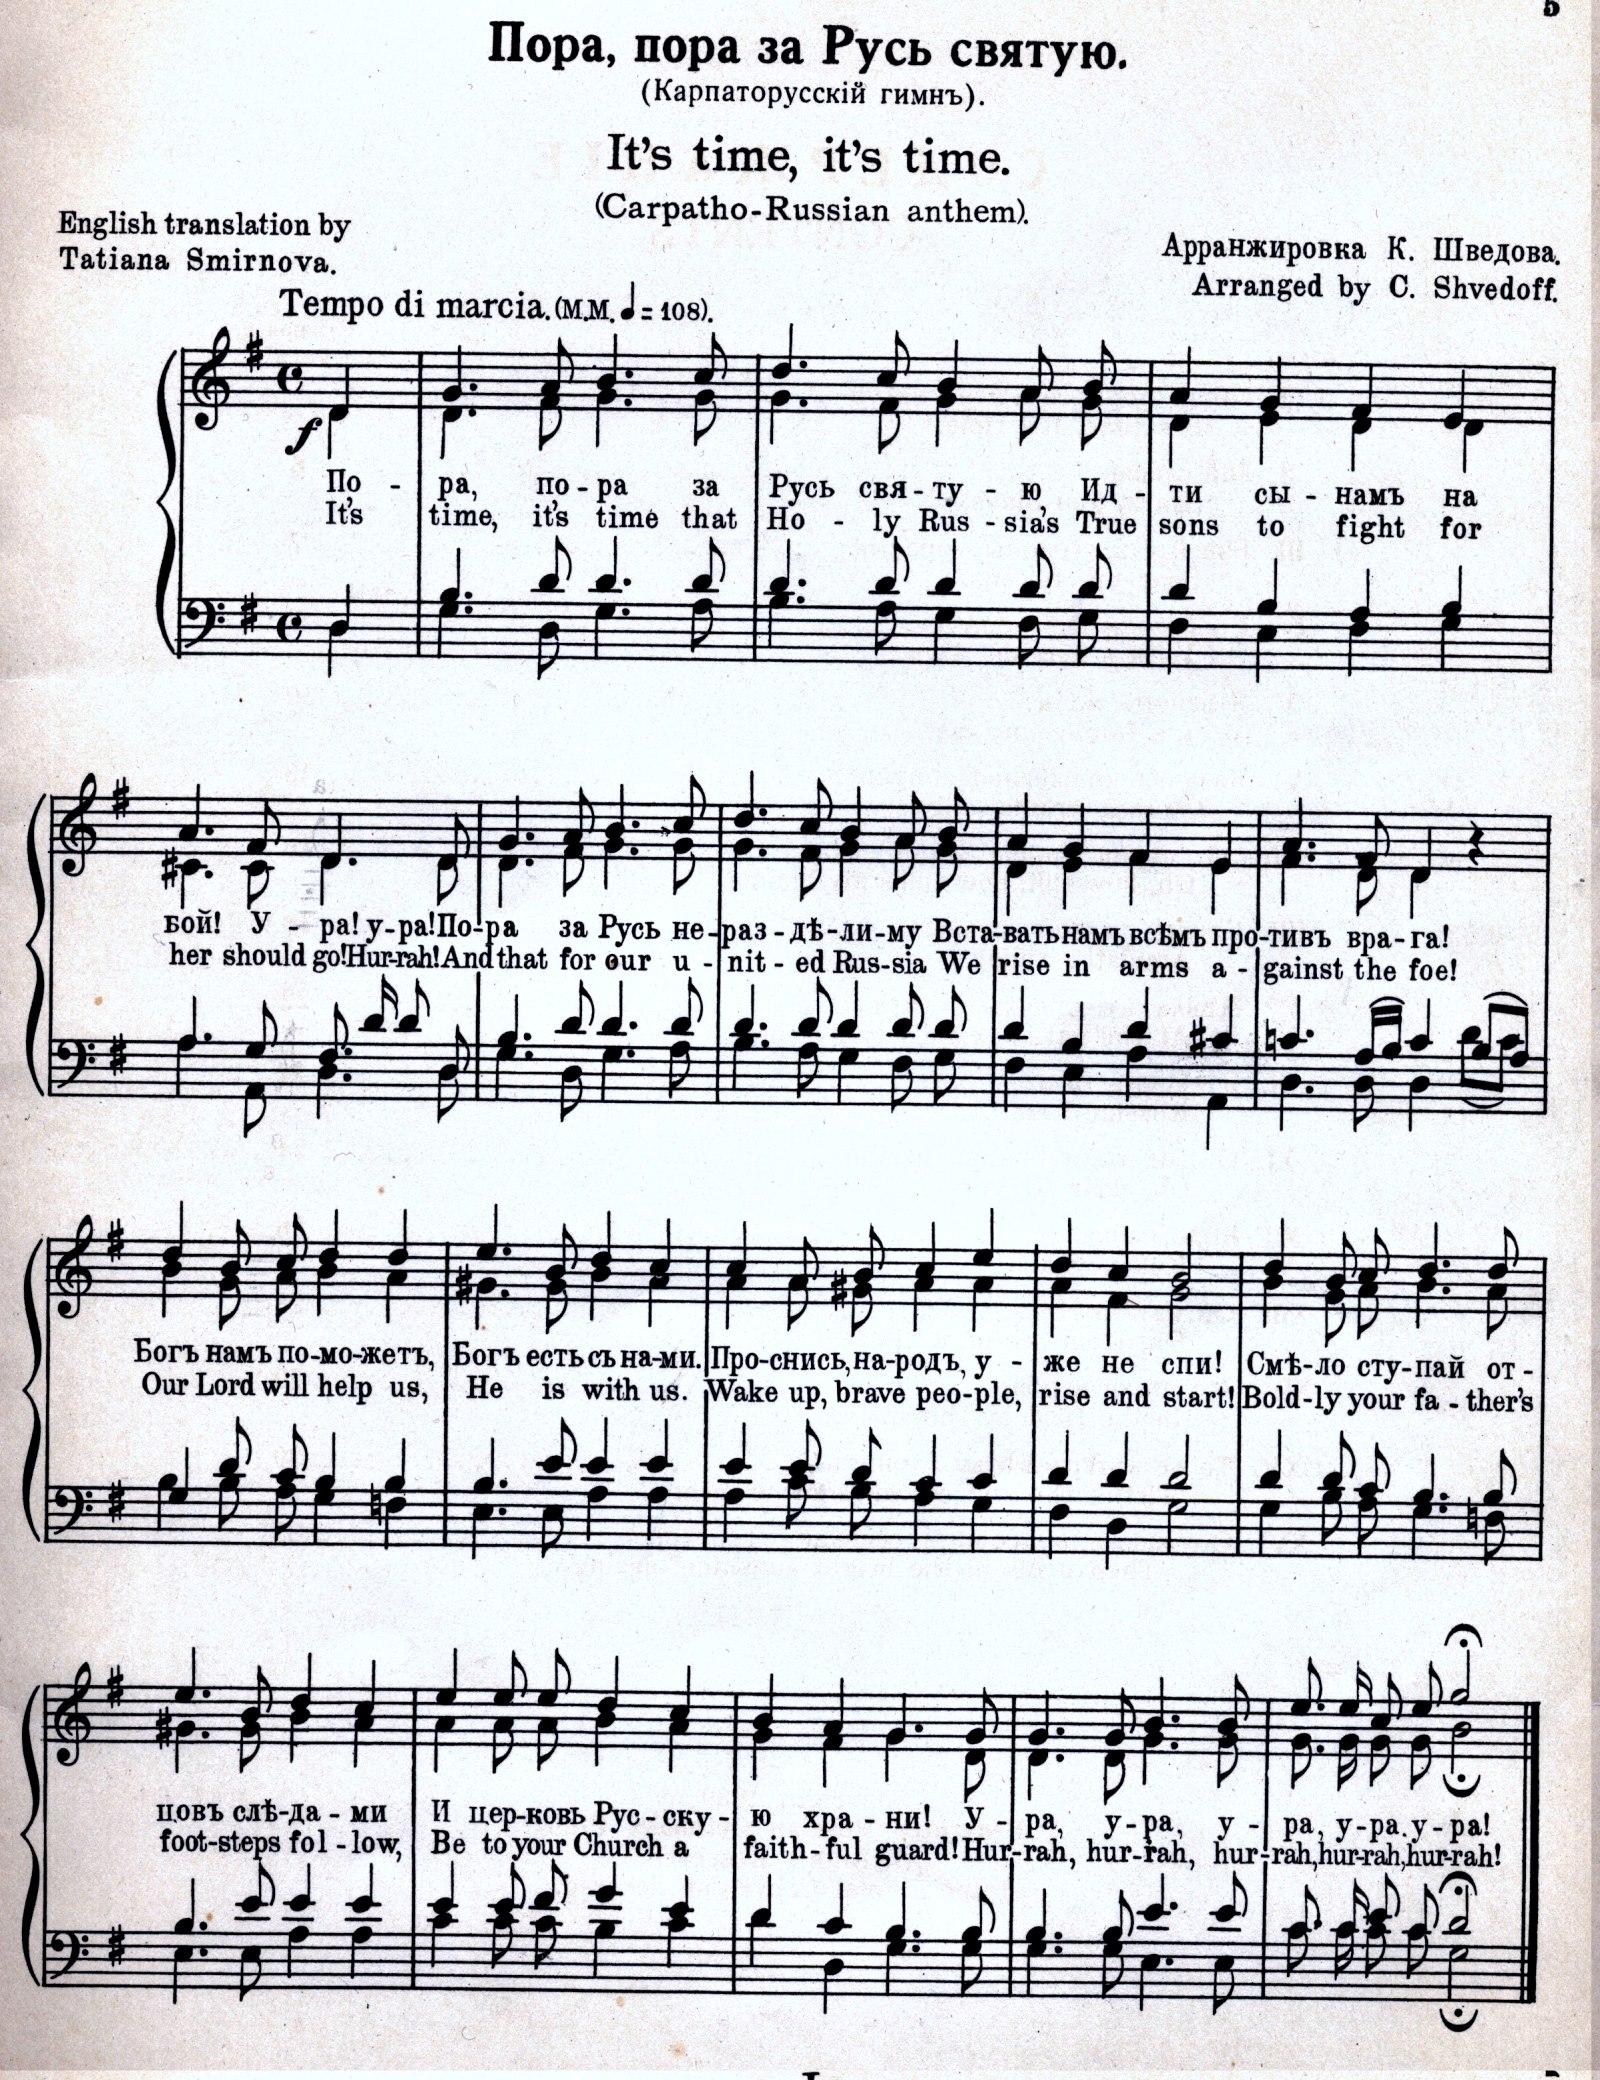 carpatho -russian anthem